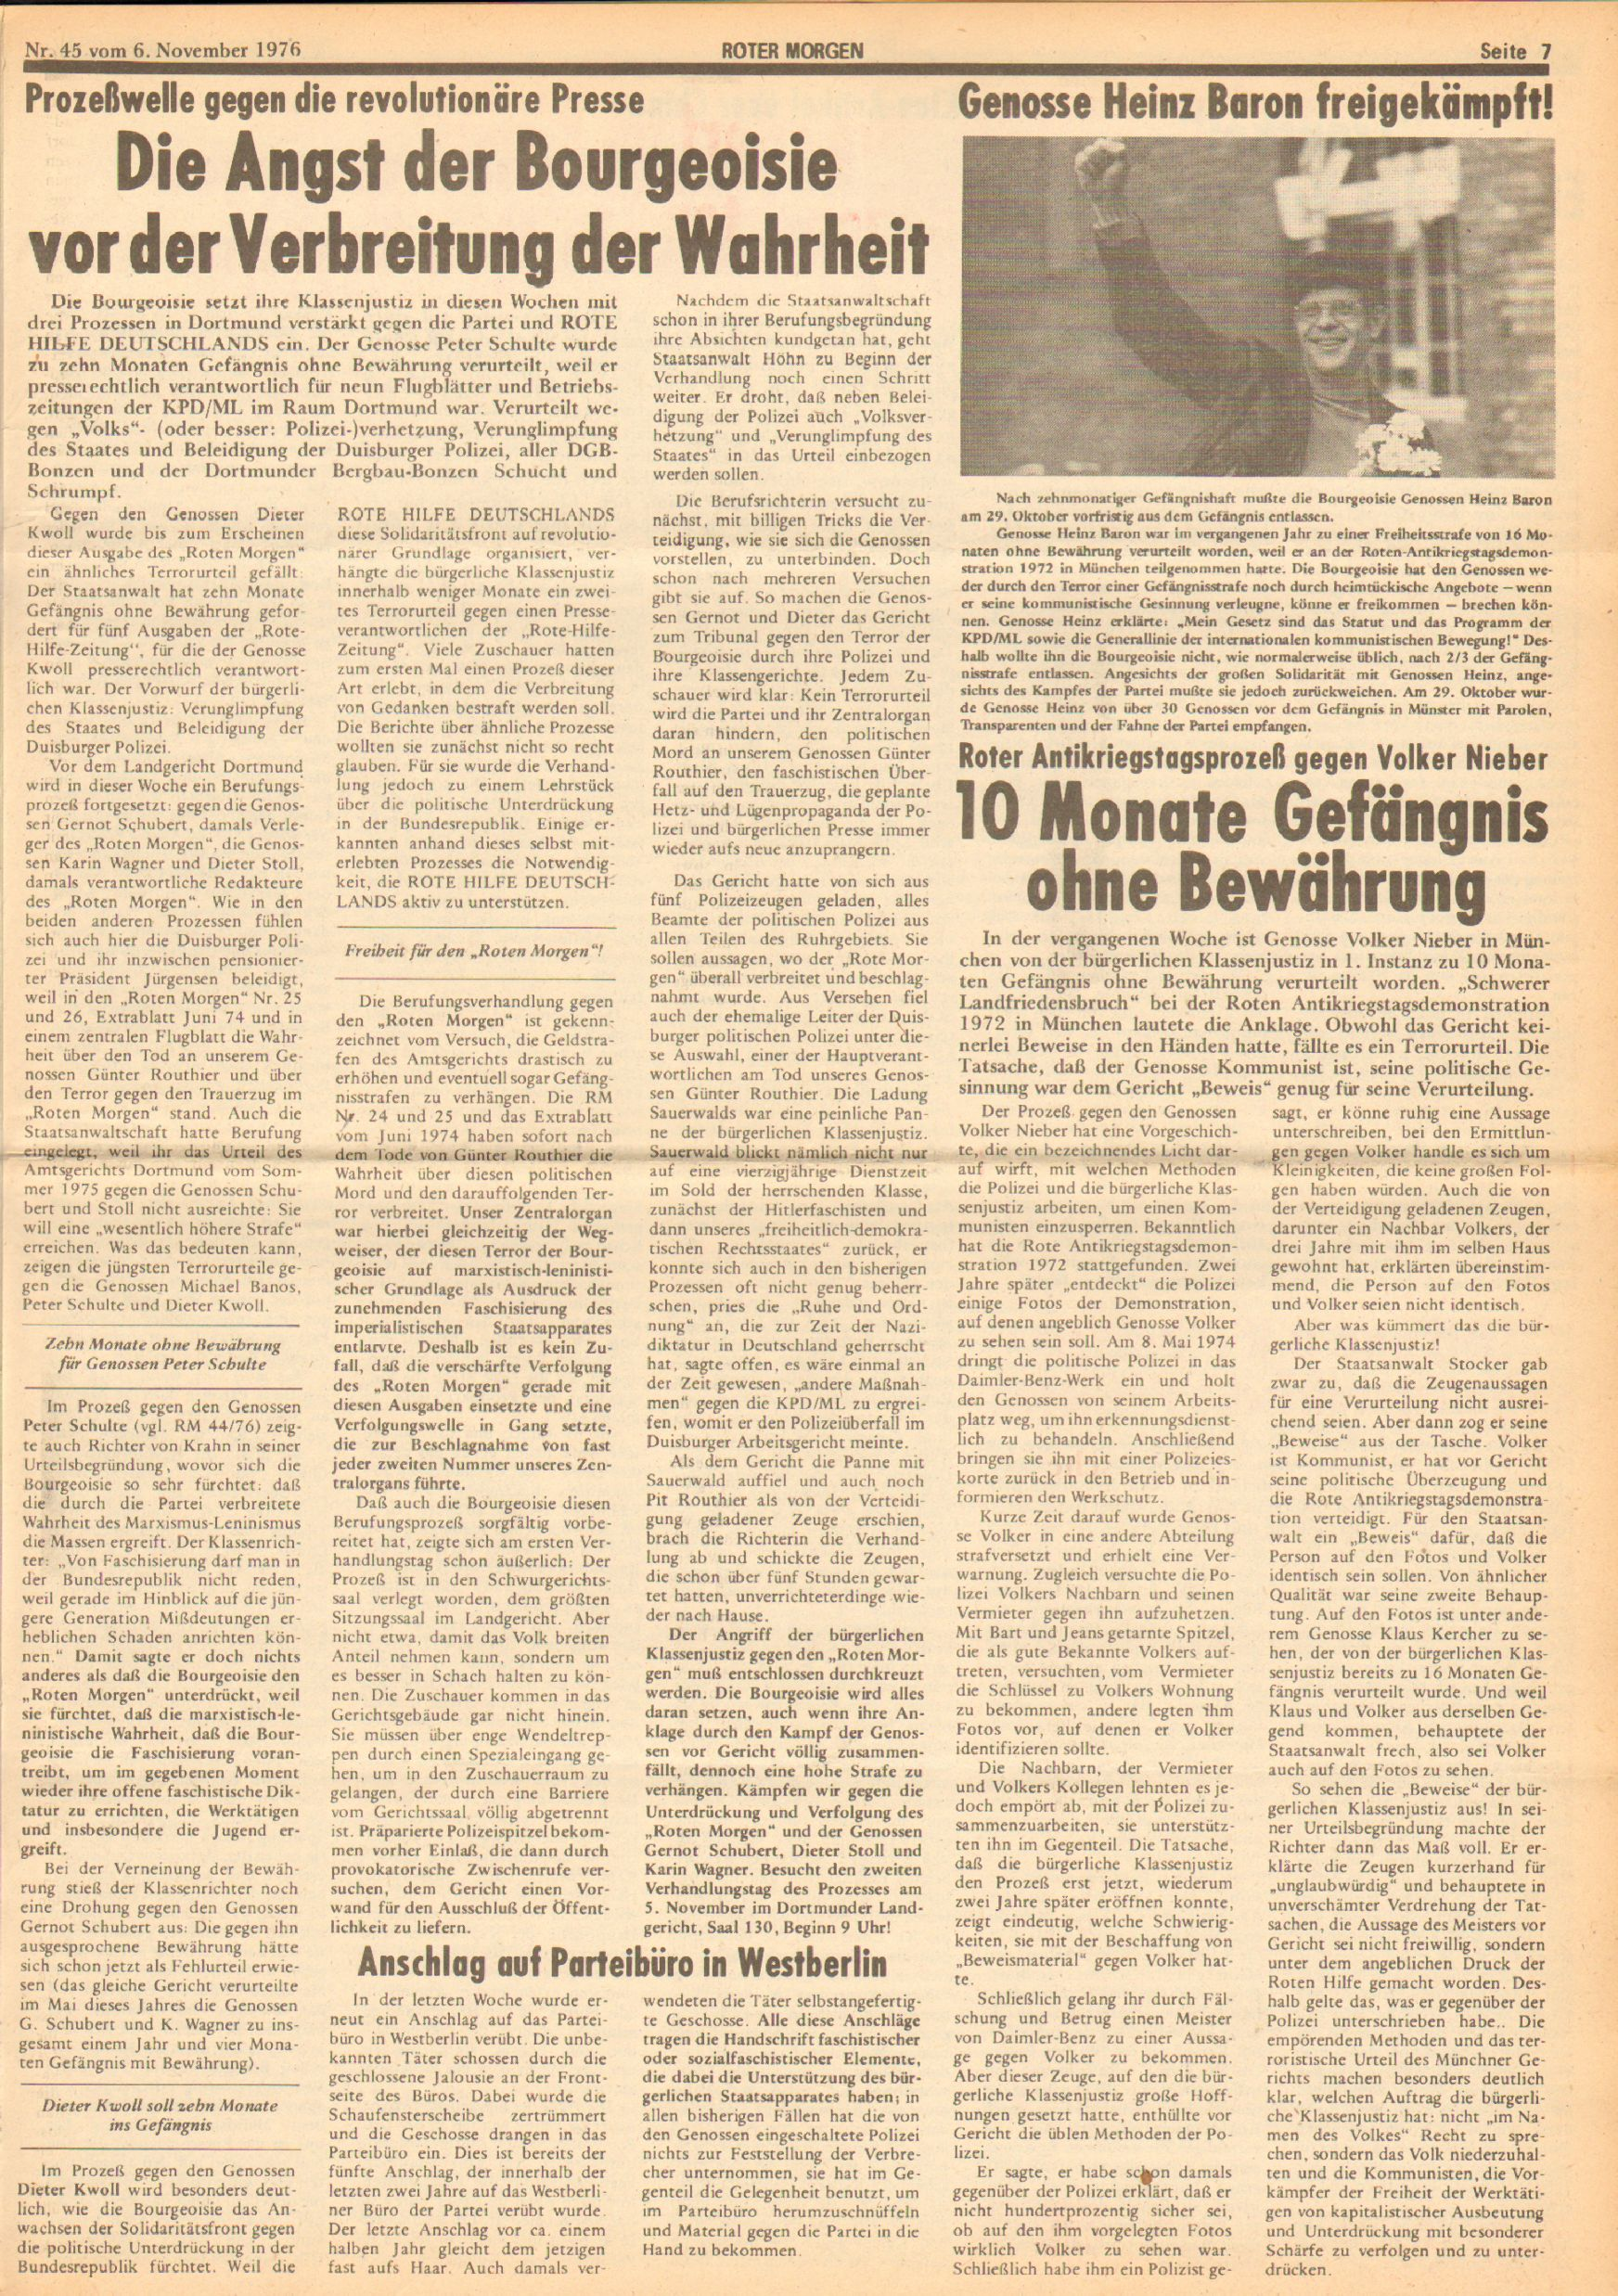 Roter Morgen, 10. Jg., 6. November 1976, Nr. 45, Seite 7